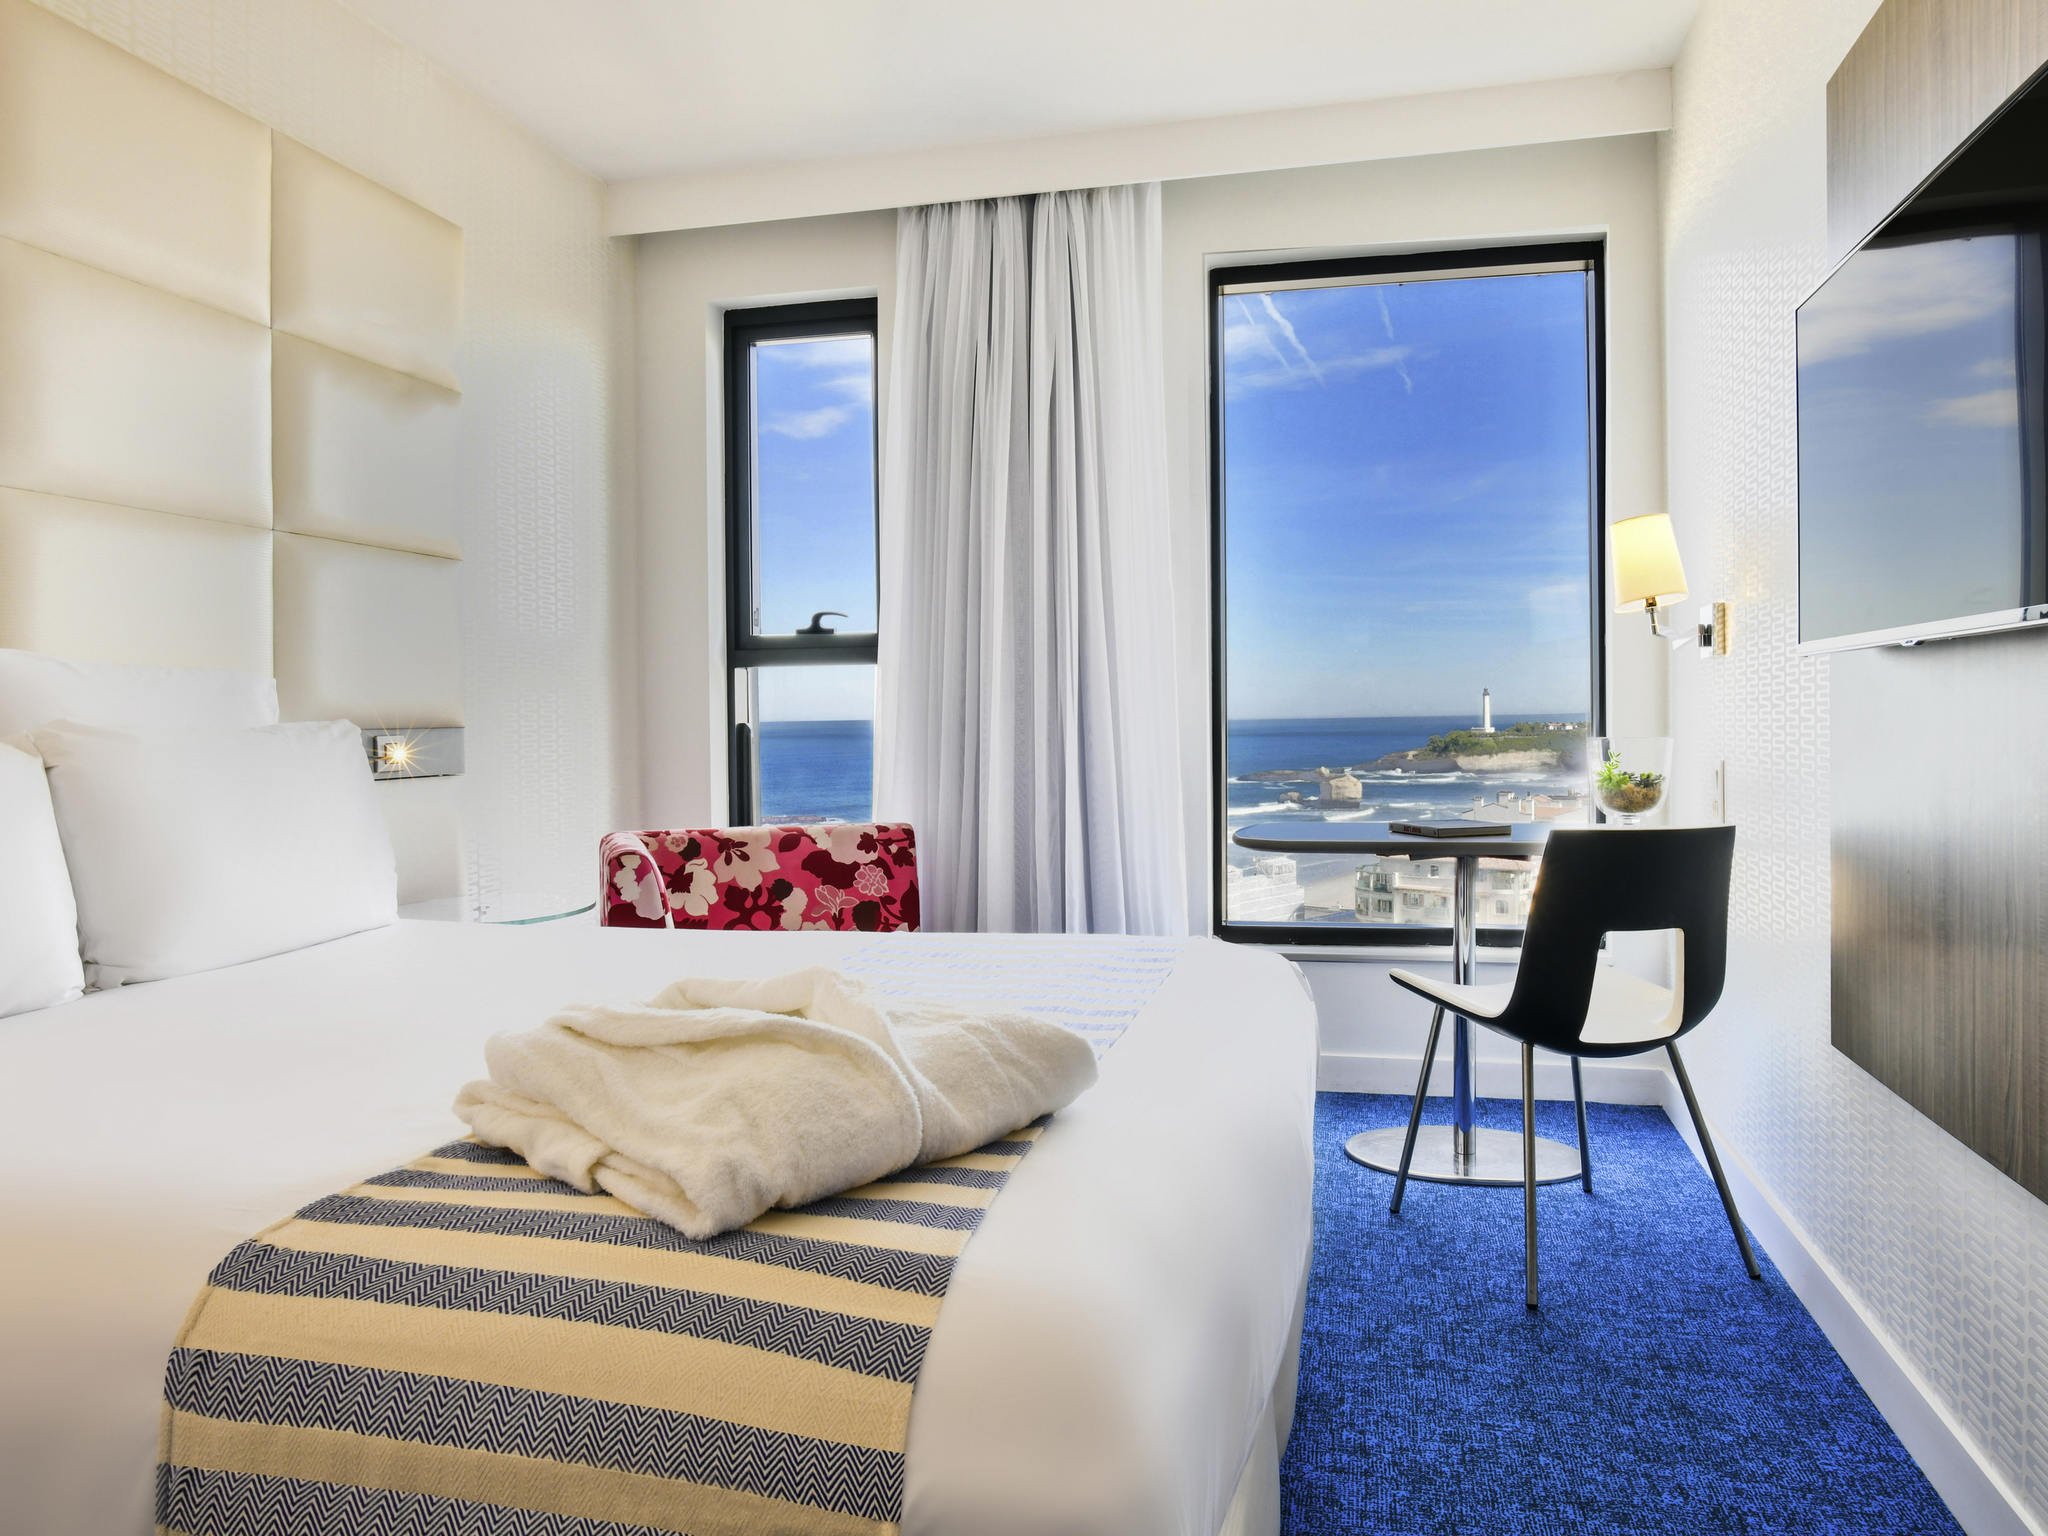 Hotel – Hotel Mercure Le President Biarritz Centre